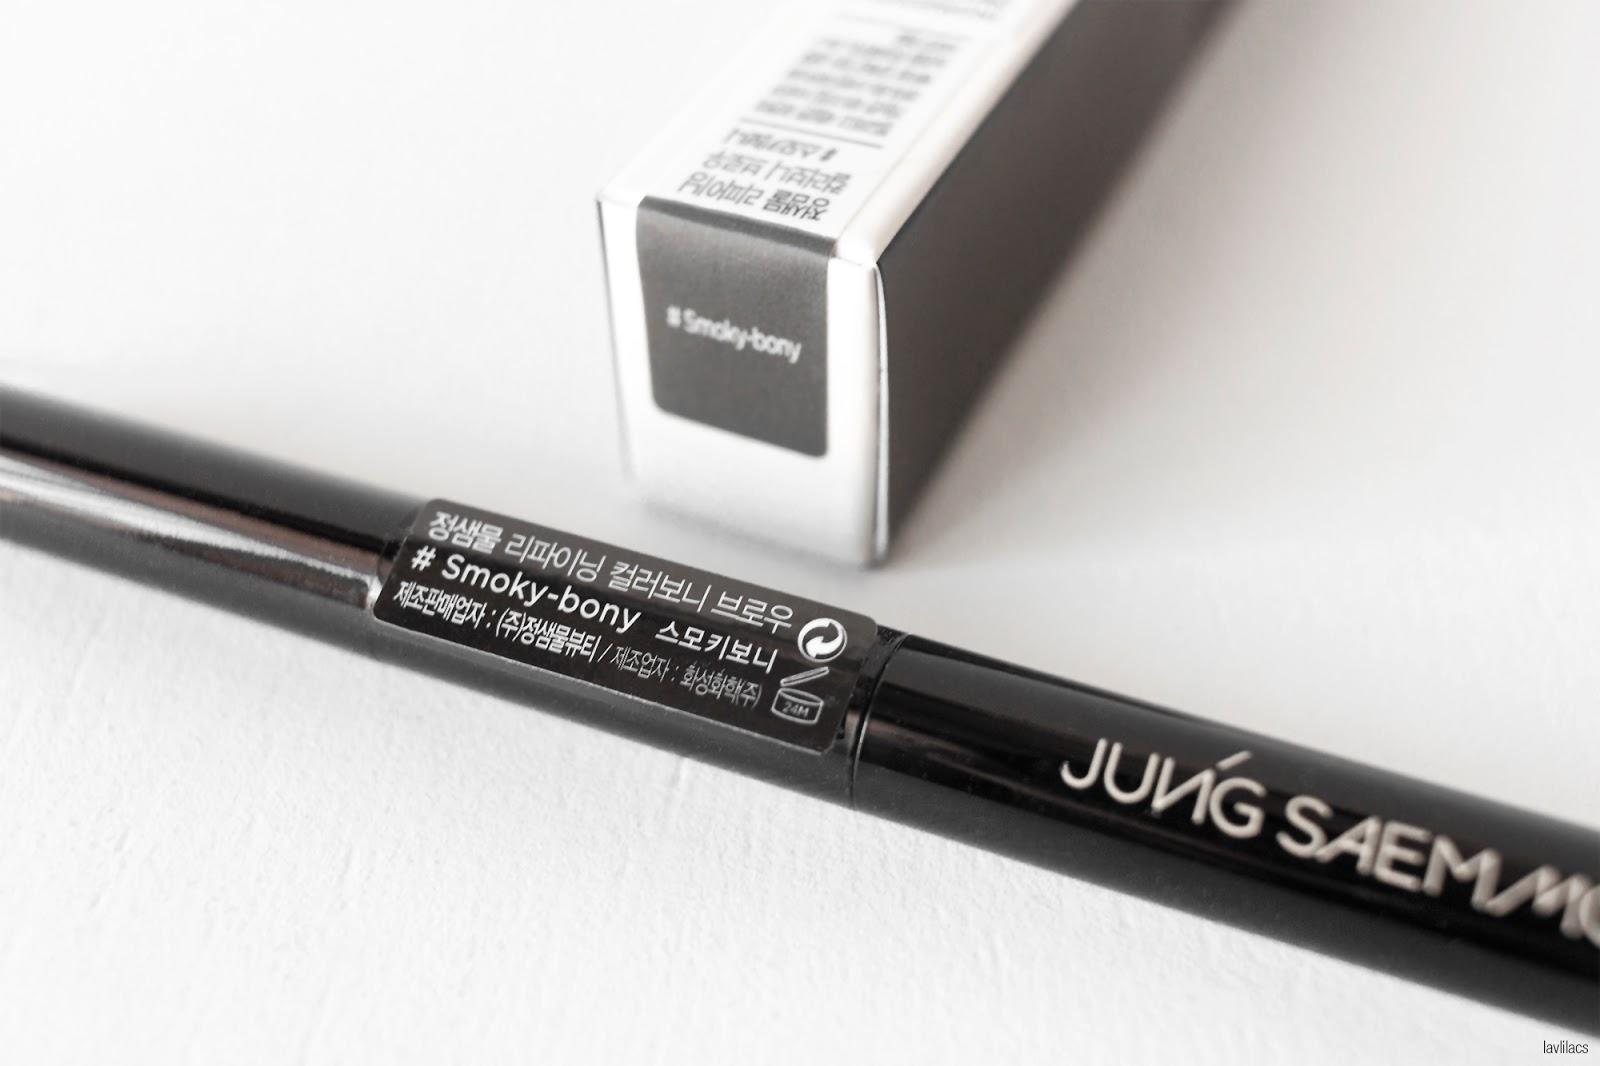 lavlilacs JUNGSAEMMOOL Refining Color-bony Brow - Smoky Bony packaging closeup